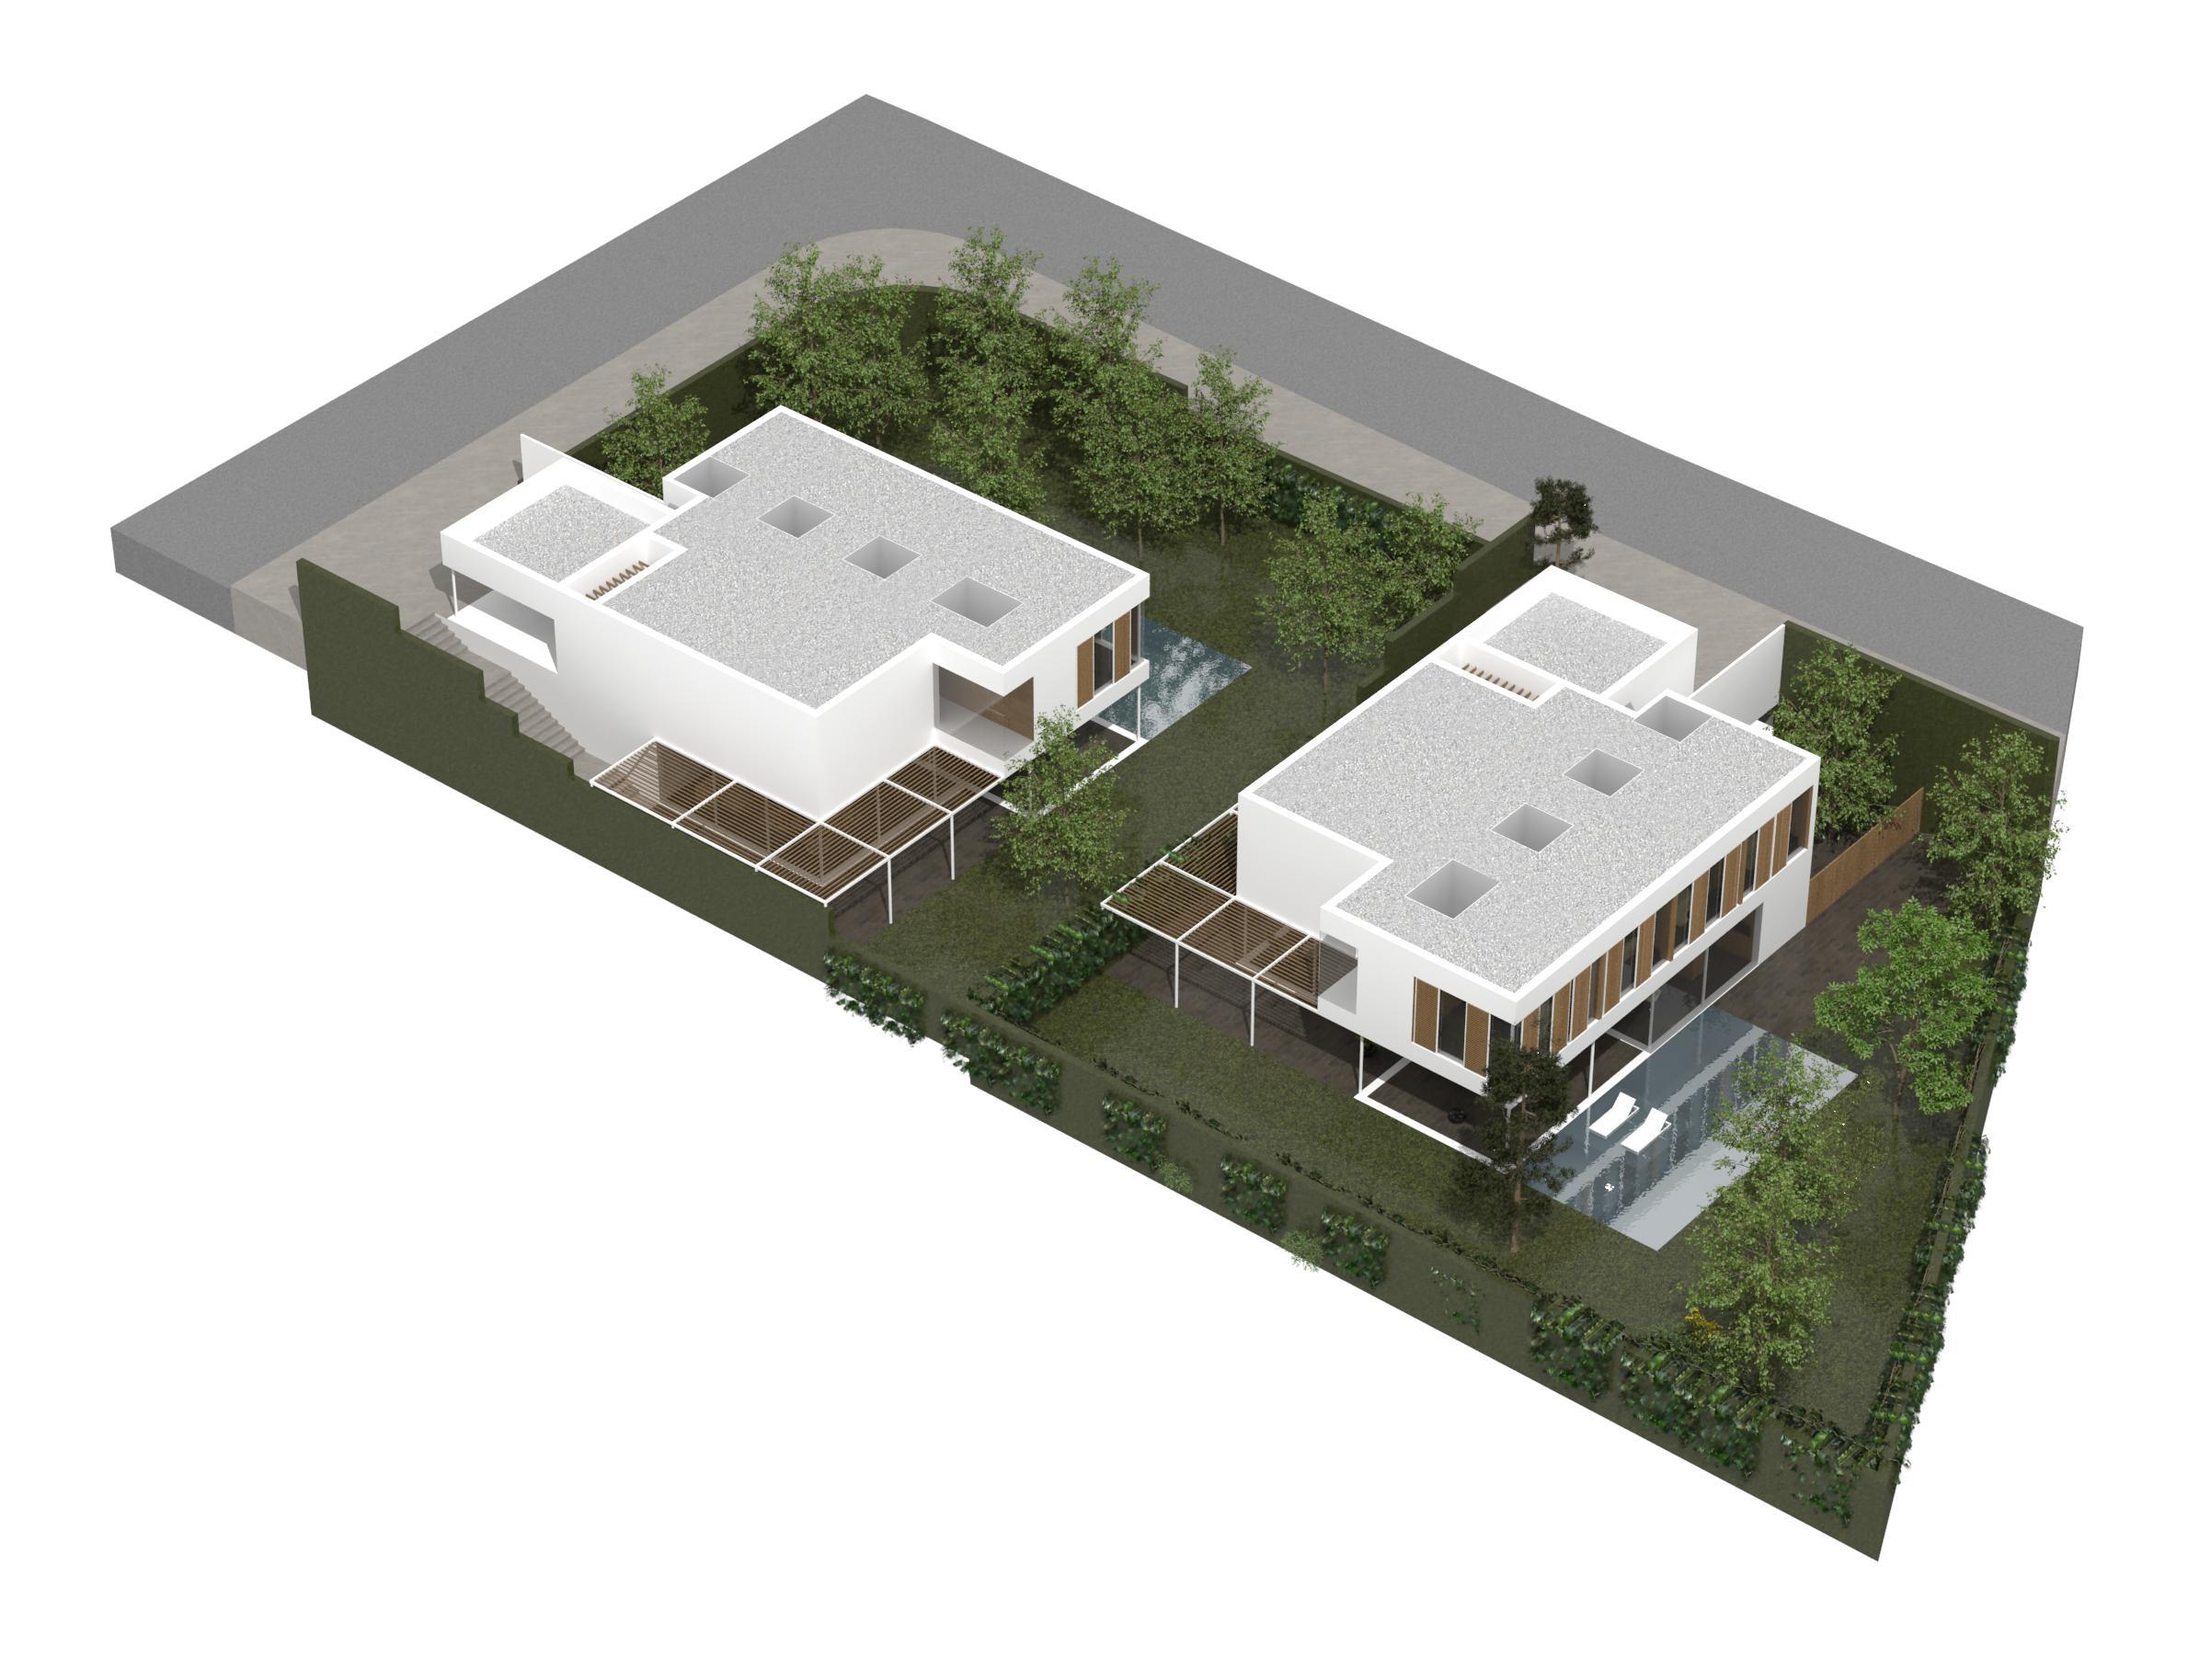 casa 2 aerea.jpg